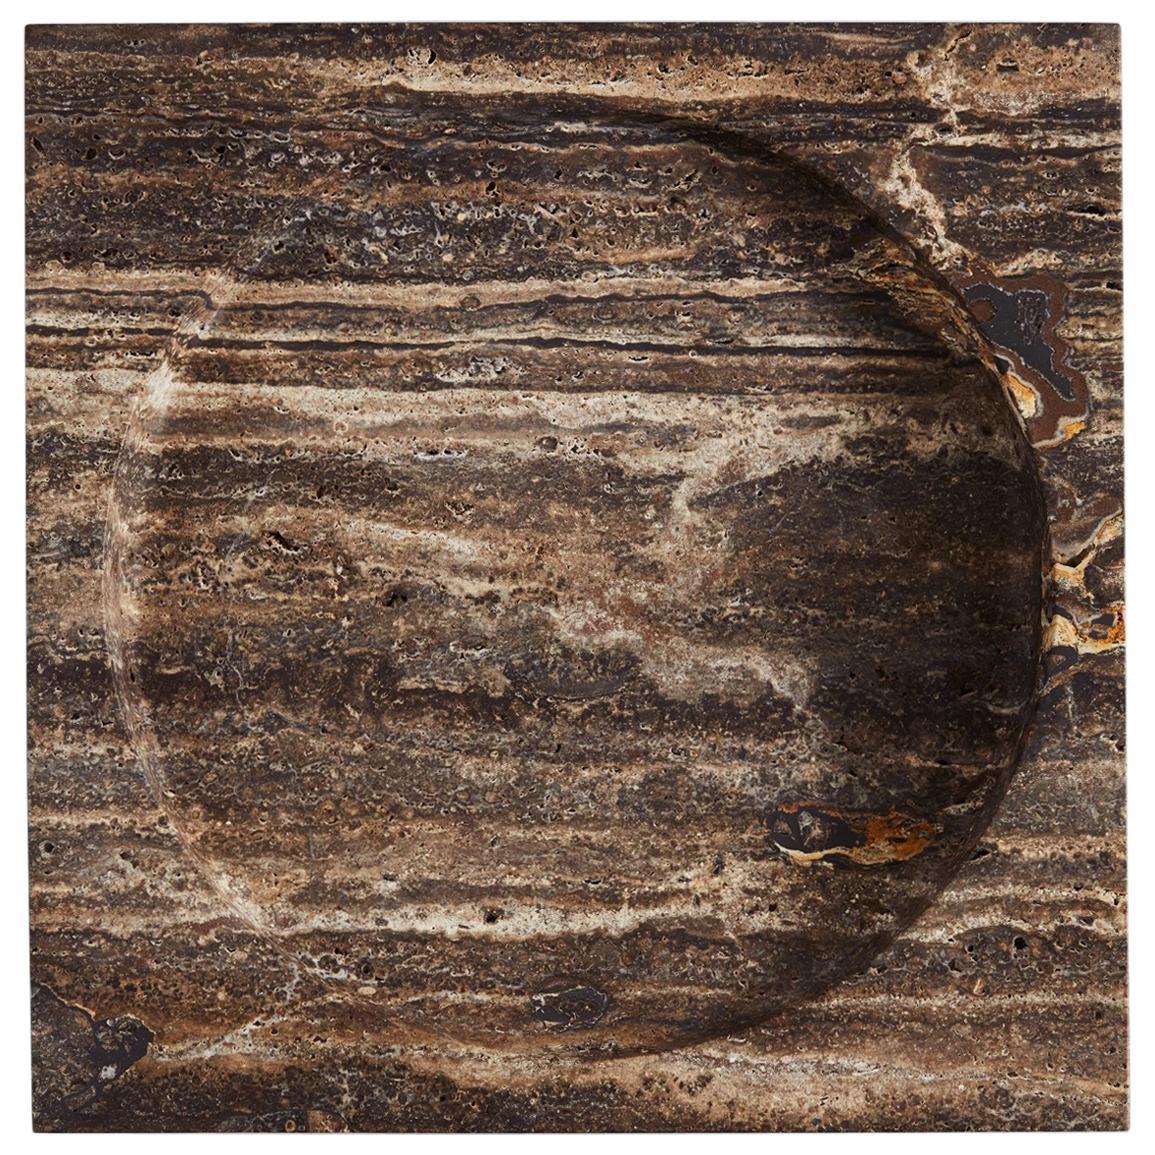 Black Travertine Stone Vide Poche by Henry Wilson